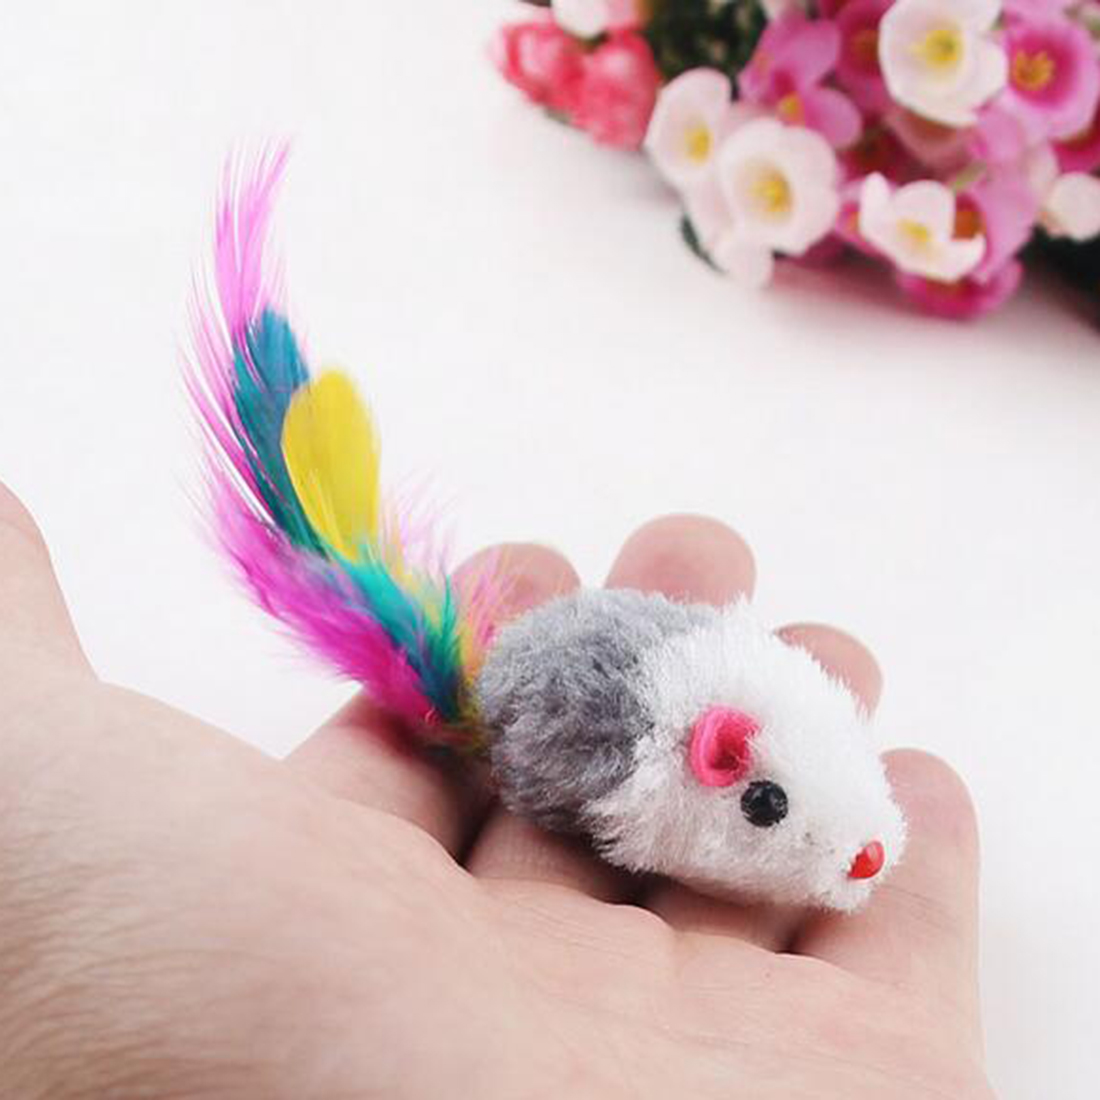 Fashion False Mouse Pet cat toys interactive Cheap Mini Funny Mice & Animal Mini Funny Playing Toys For Cats Kitten 4.5 x 2.5 cm